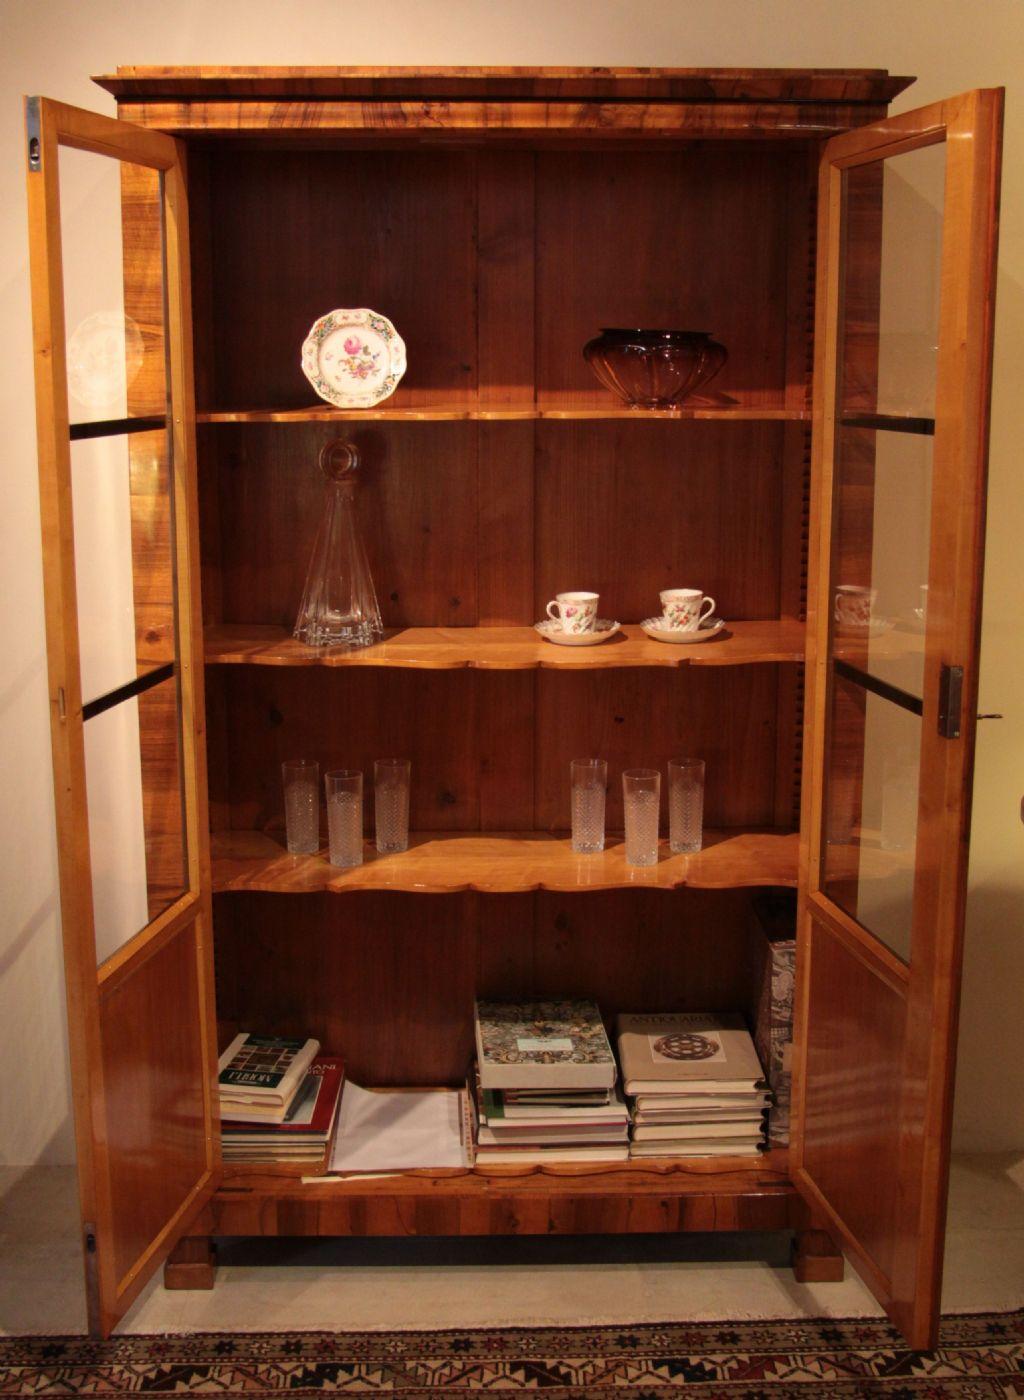 Splendida vetrina biedermeier austria 1840 circa venduto antiquariato su anticoantico - Mobili biedermeier ...